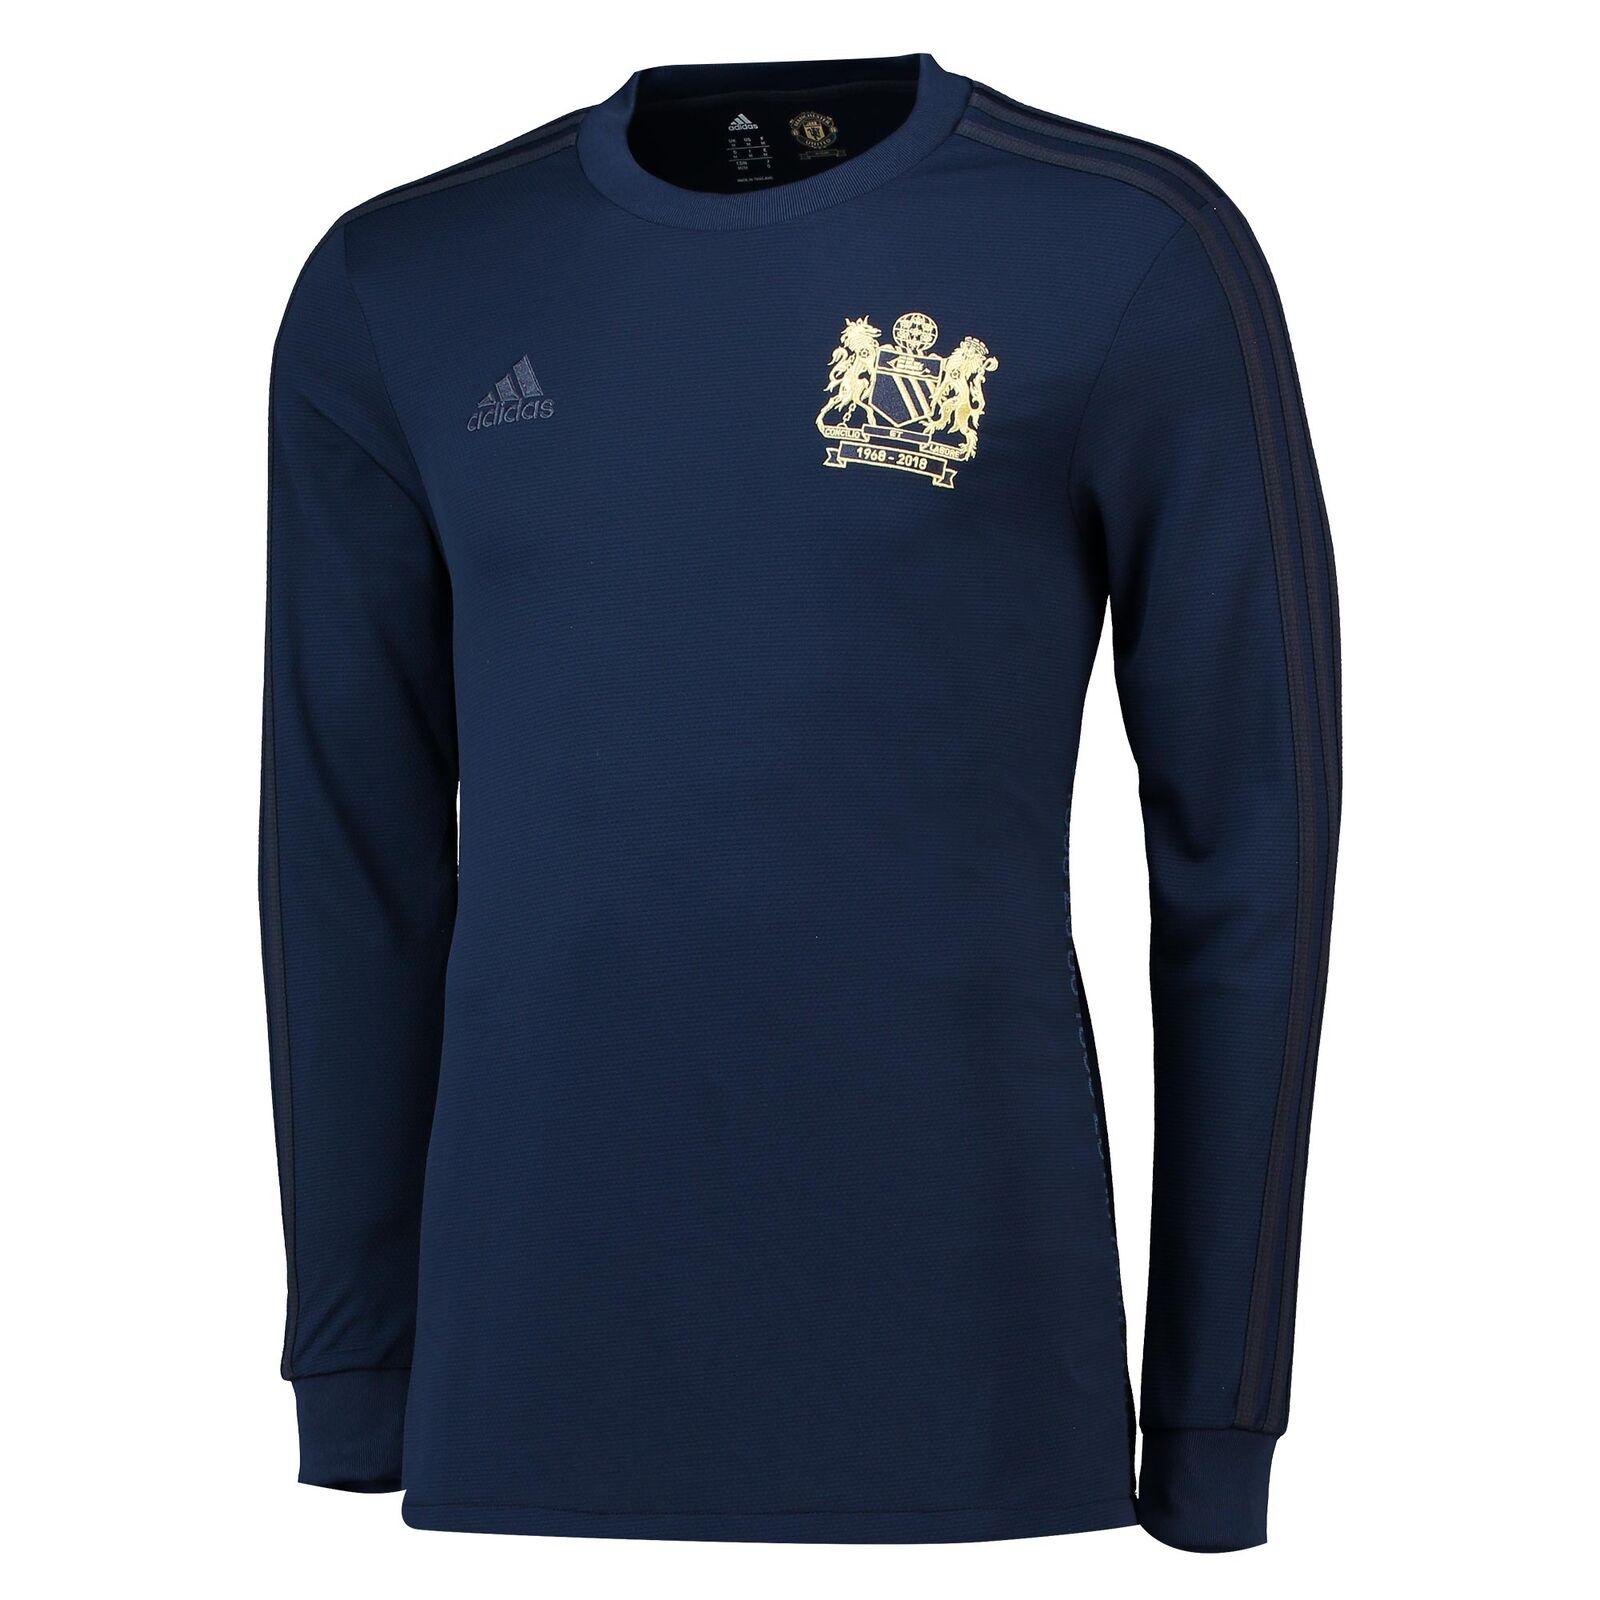 Manchester United 1968 Special Edition Fußball Trikot Sport Shirt Herren adidas